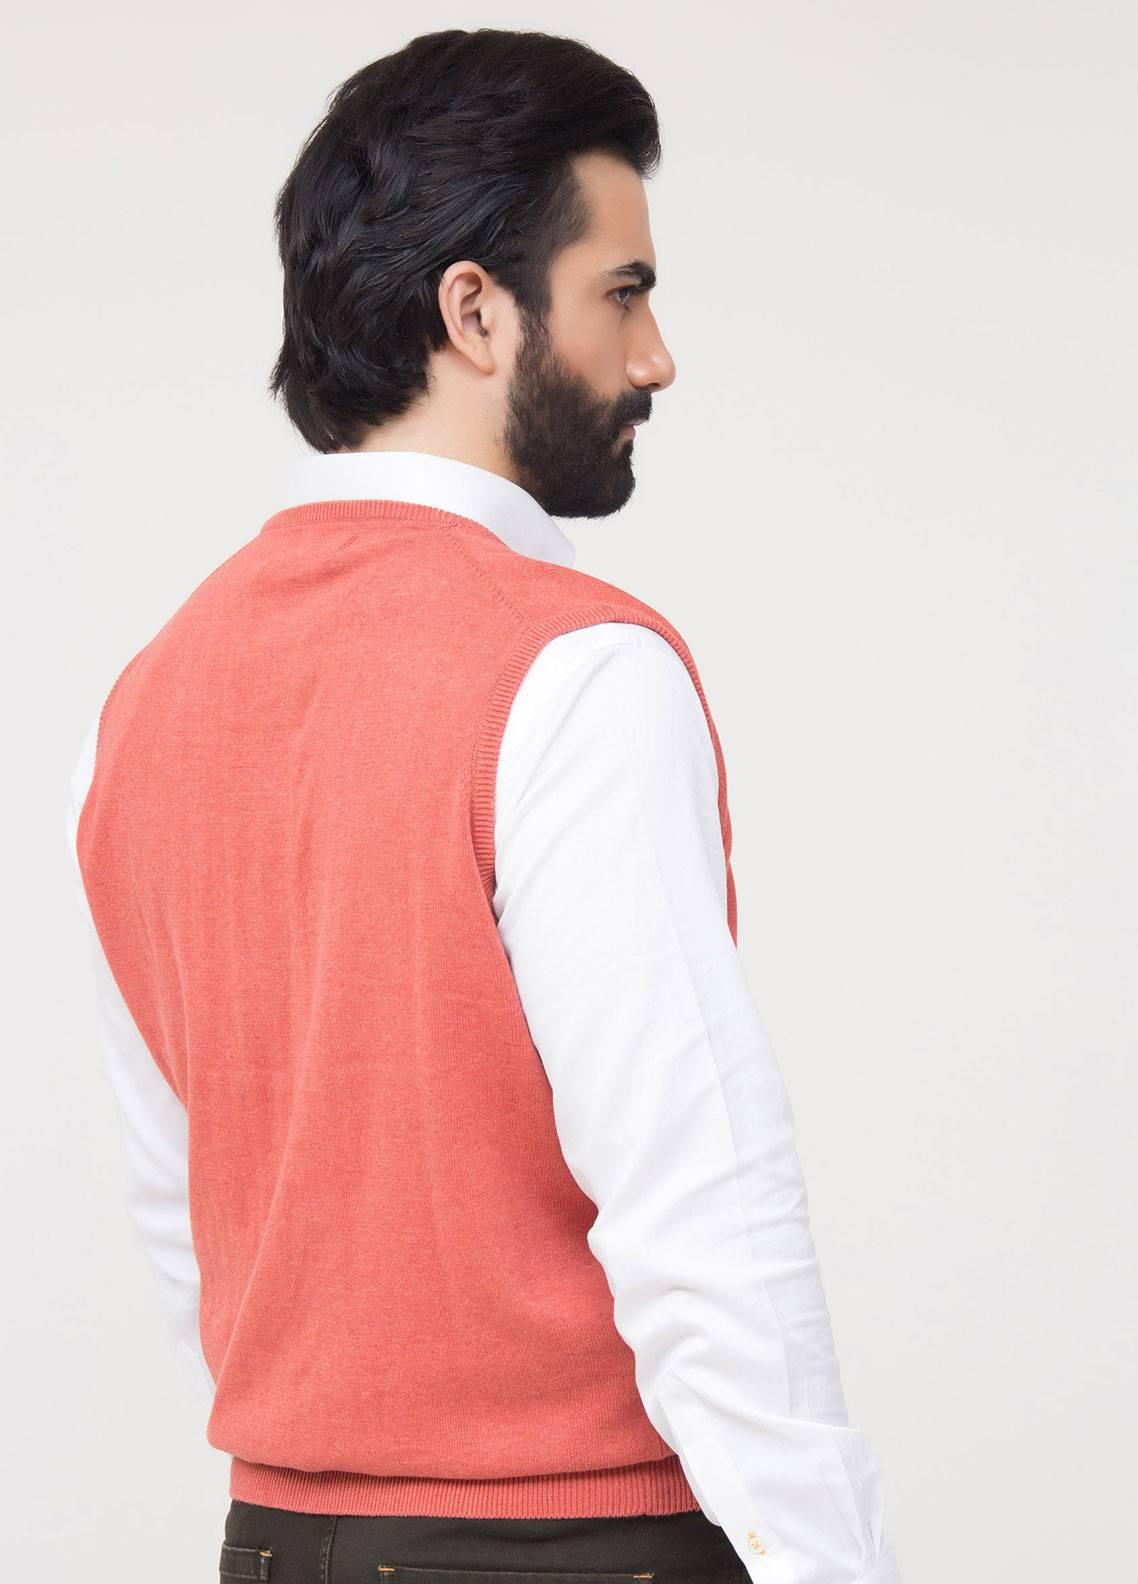 Brumano Cotton Sleeveless Men V-Neck Sweaters - Red SL-534